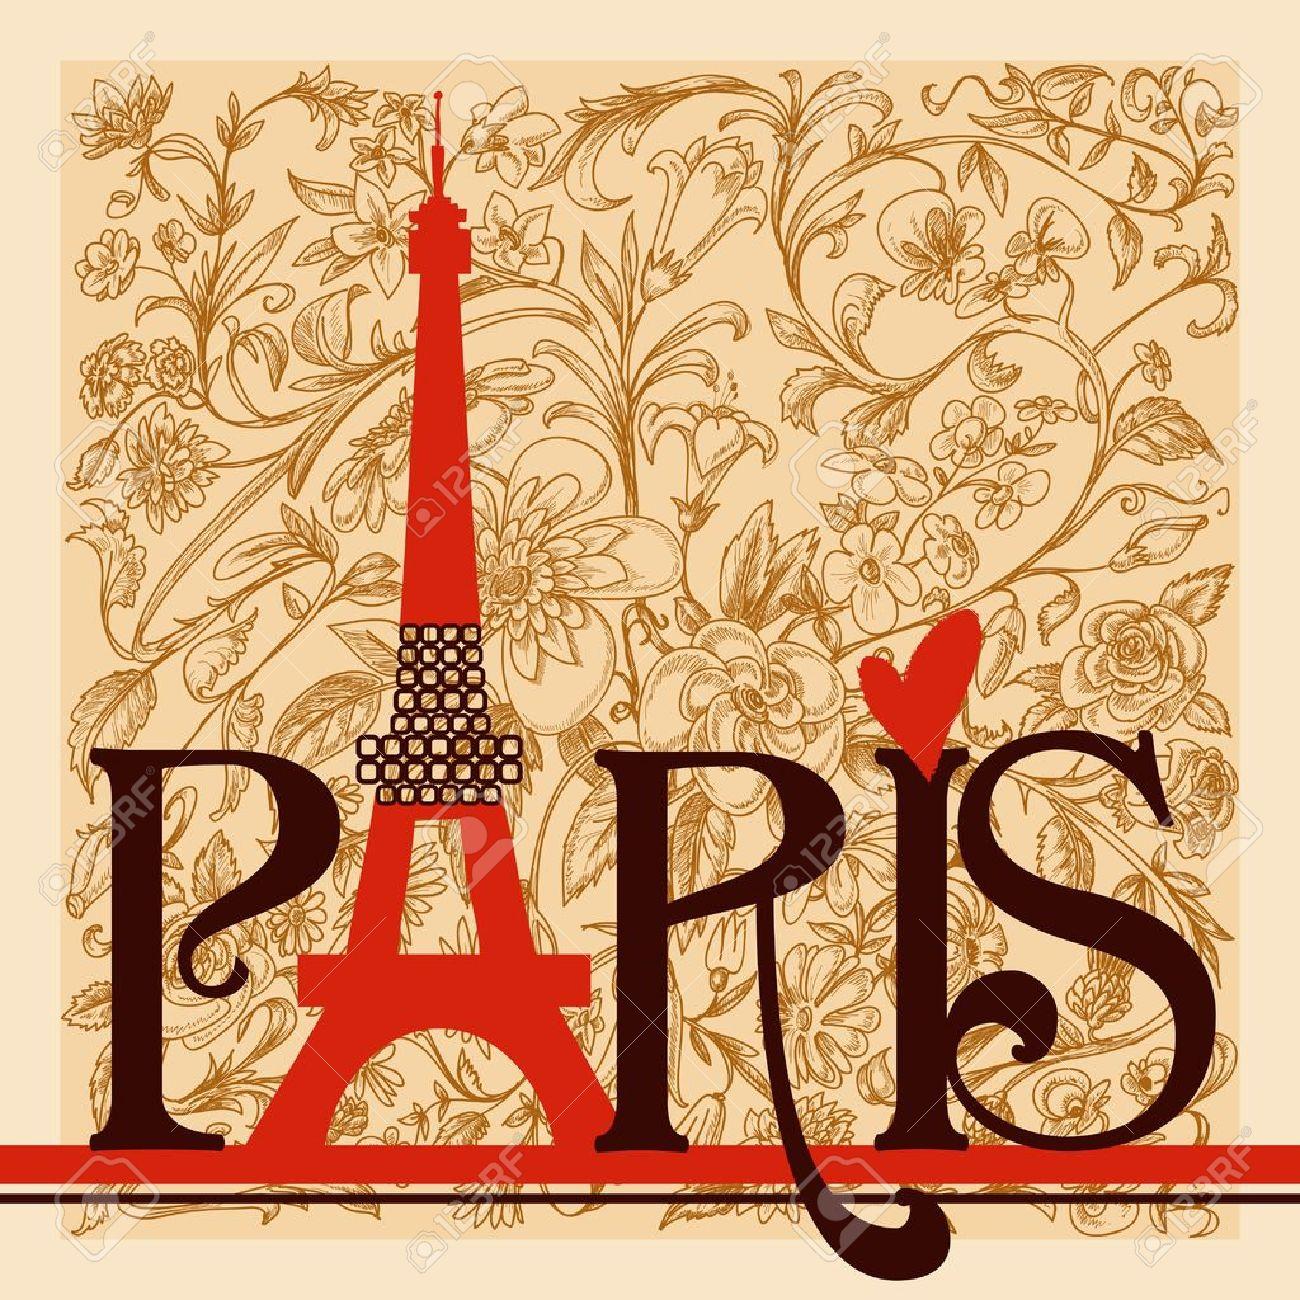 Paris lettering over vintage floral background Stock Vector - 12763568